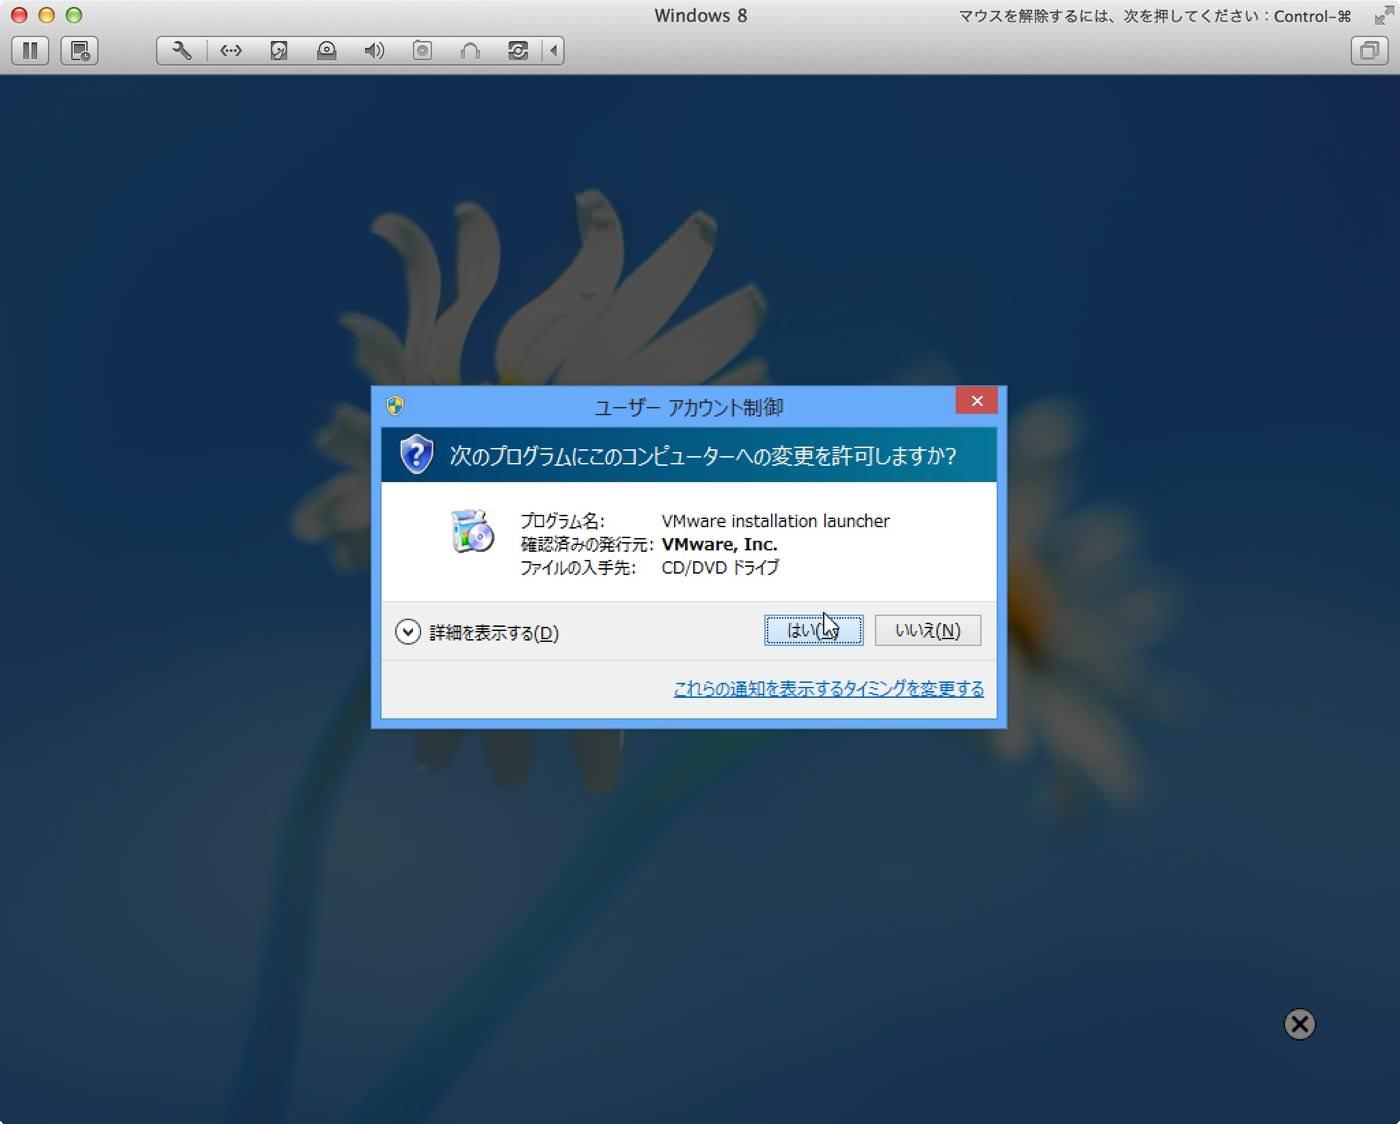 Windows8のユーザーアカウント制御アラート